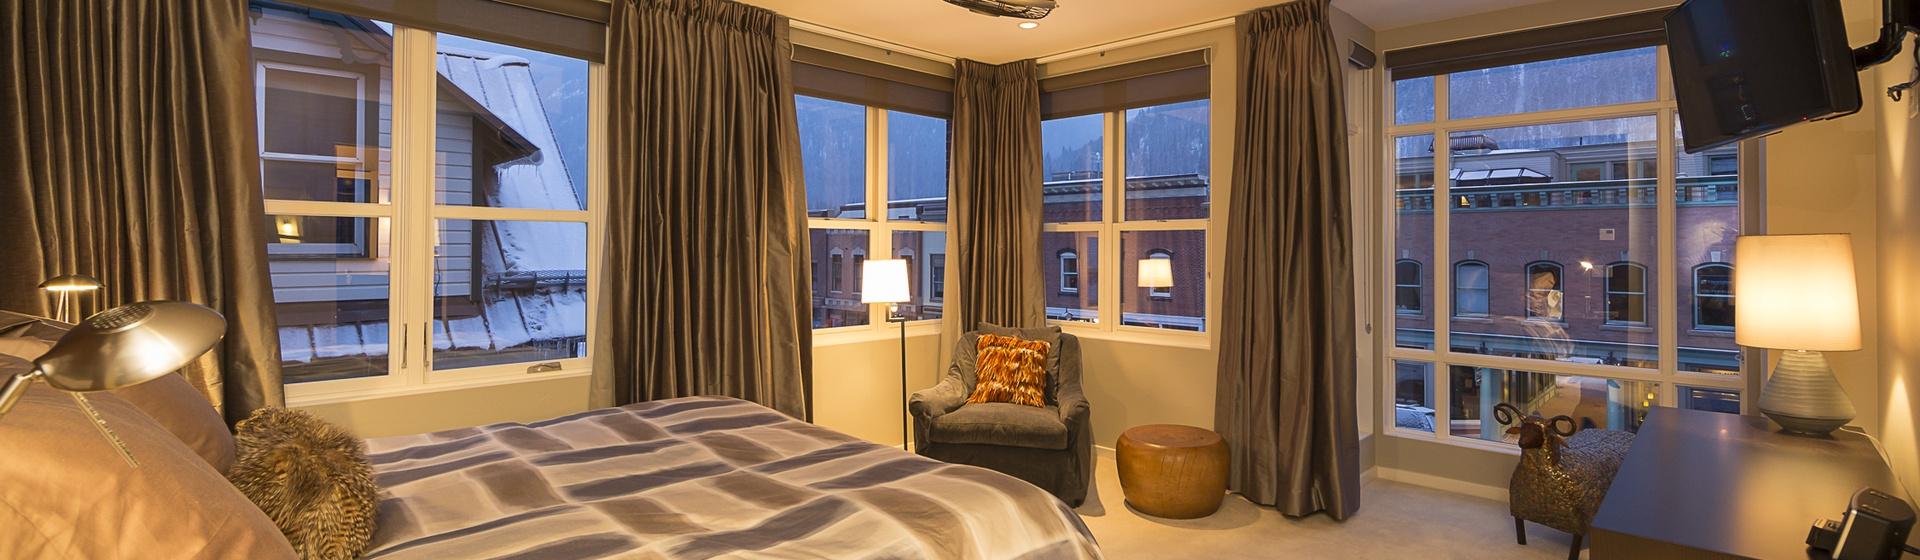 25-Telluride-Trulux-Penthouse-MasterBedroom.jpg